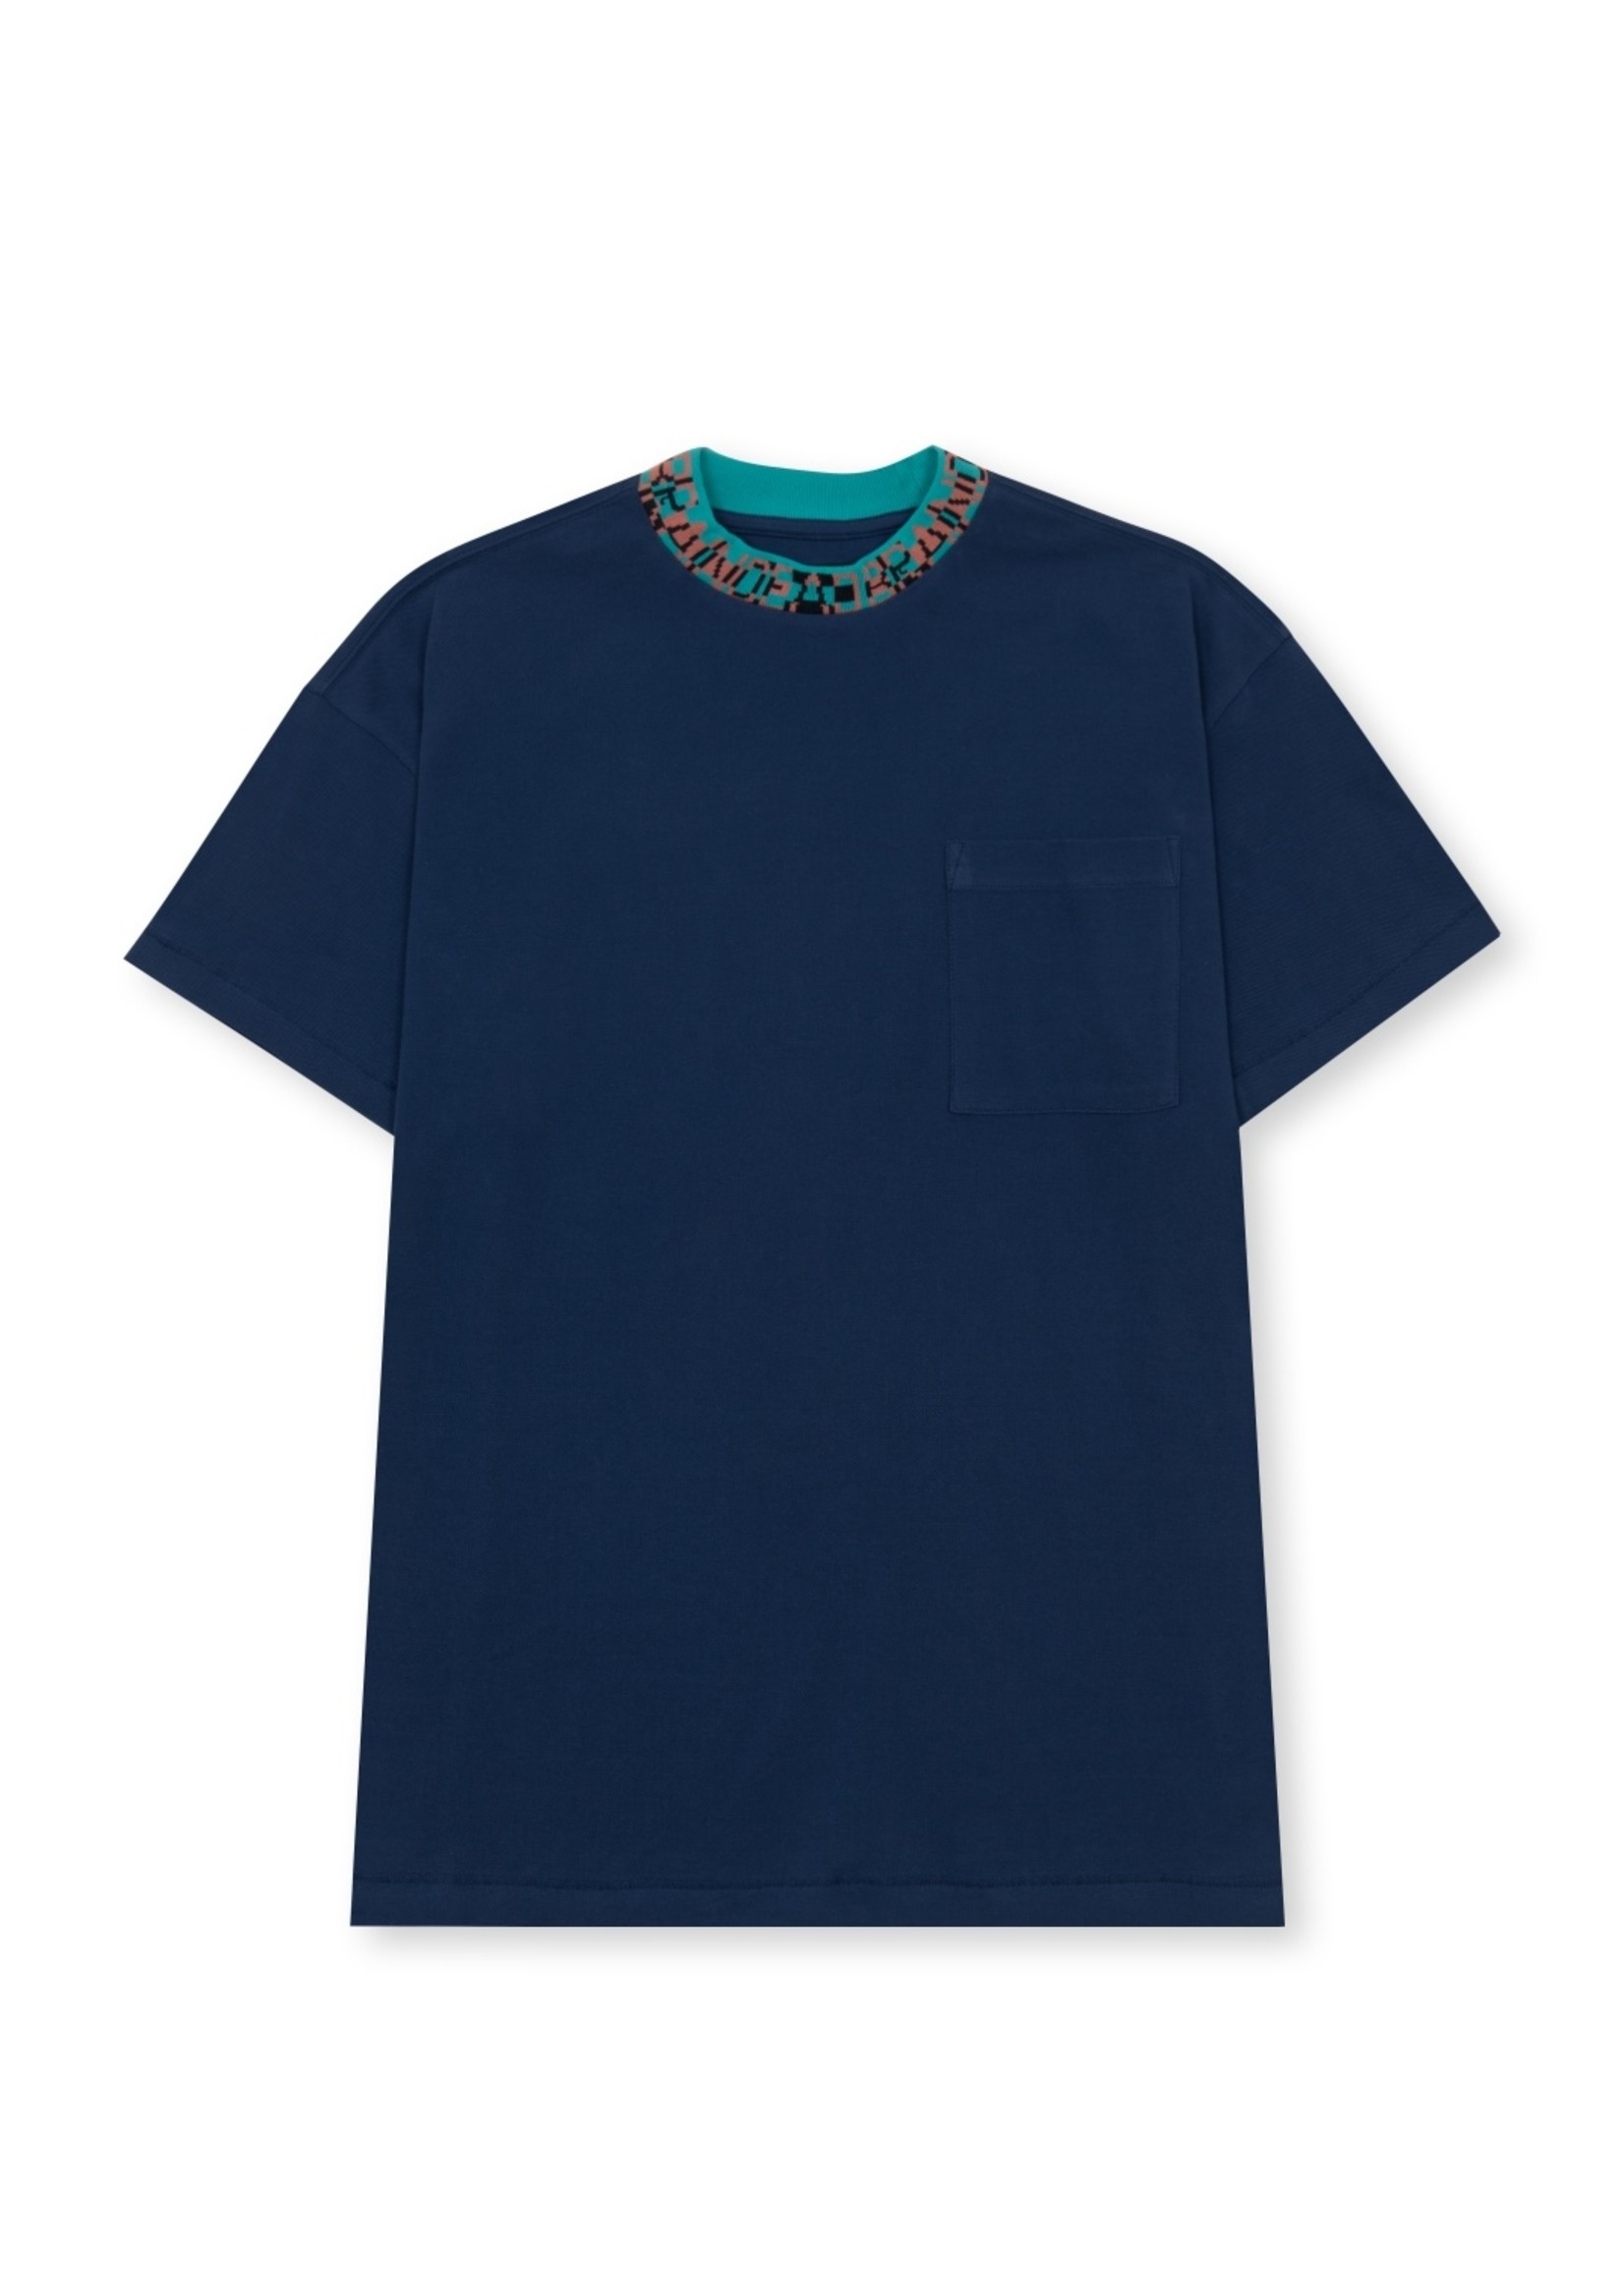 Brain Dead Jacquard Collar Pique Mock-neck shirt in Navy